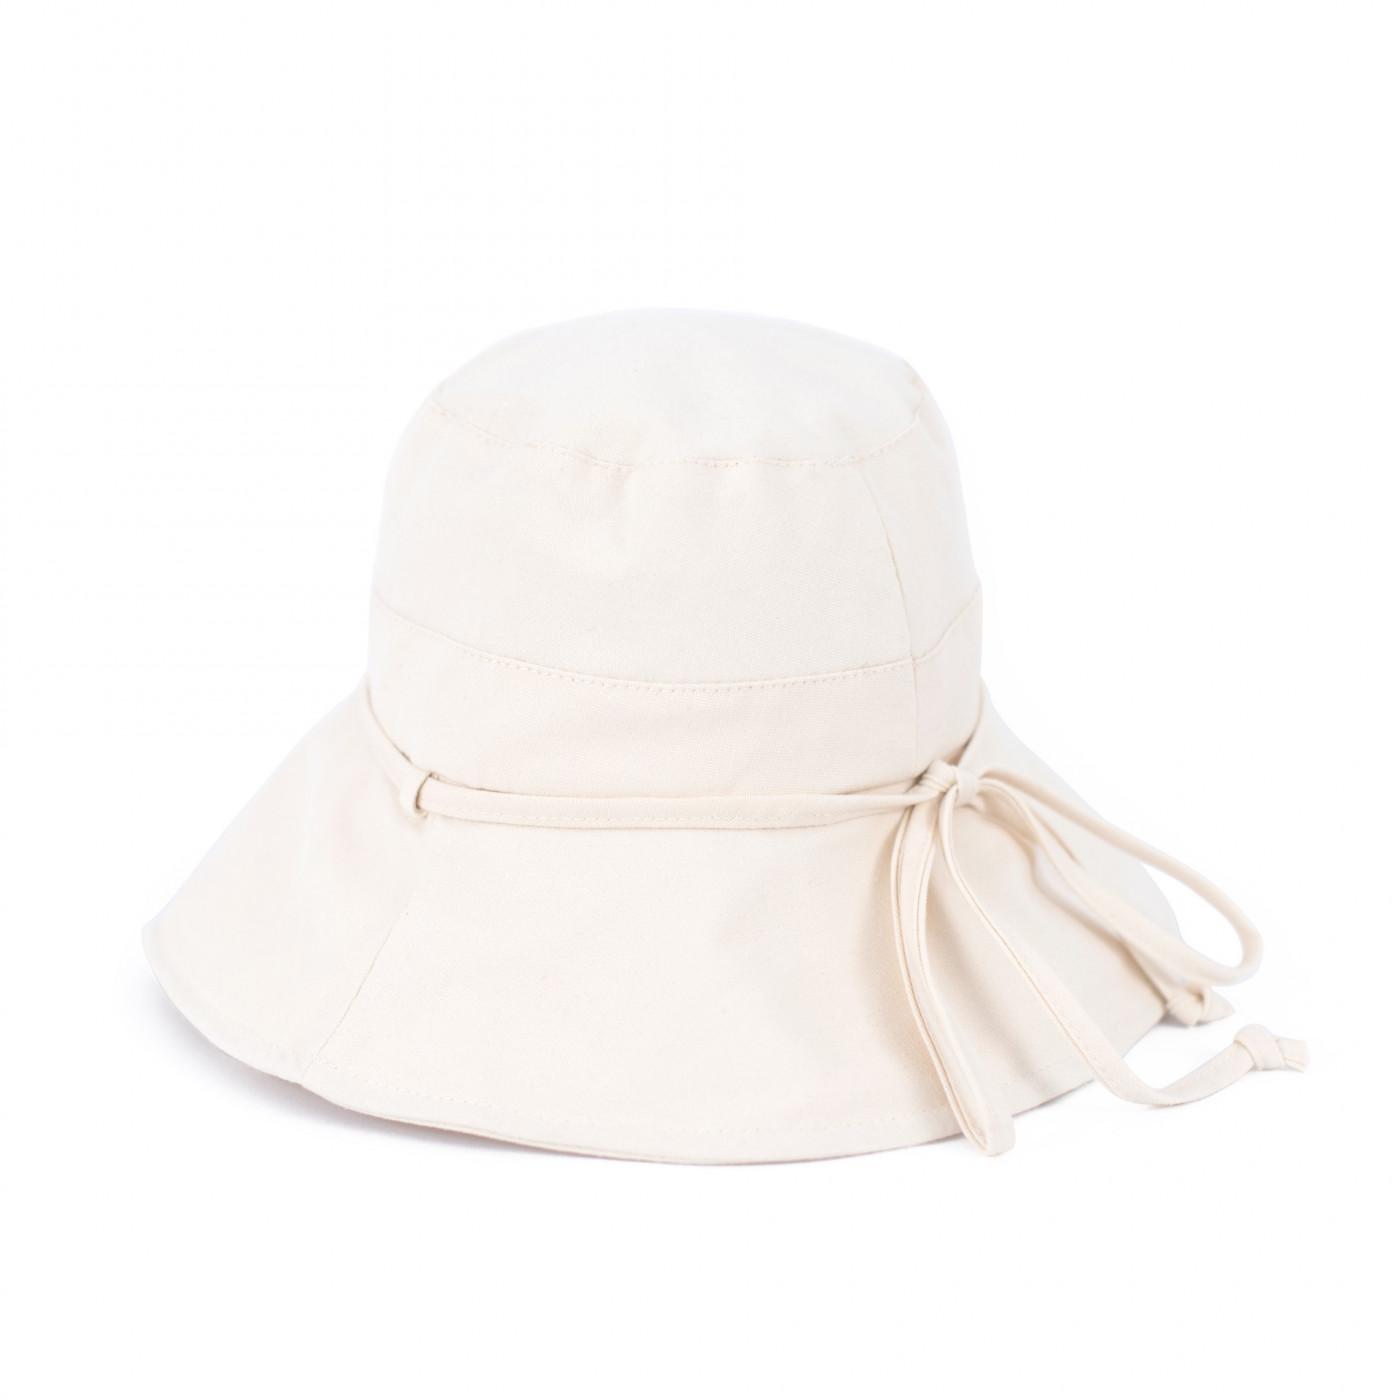 Art Of Polo Woman's Hat cz19127